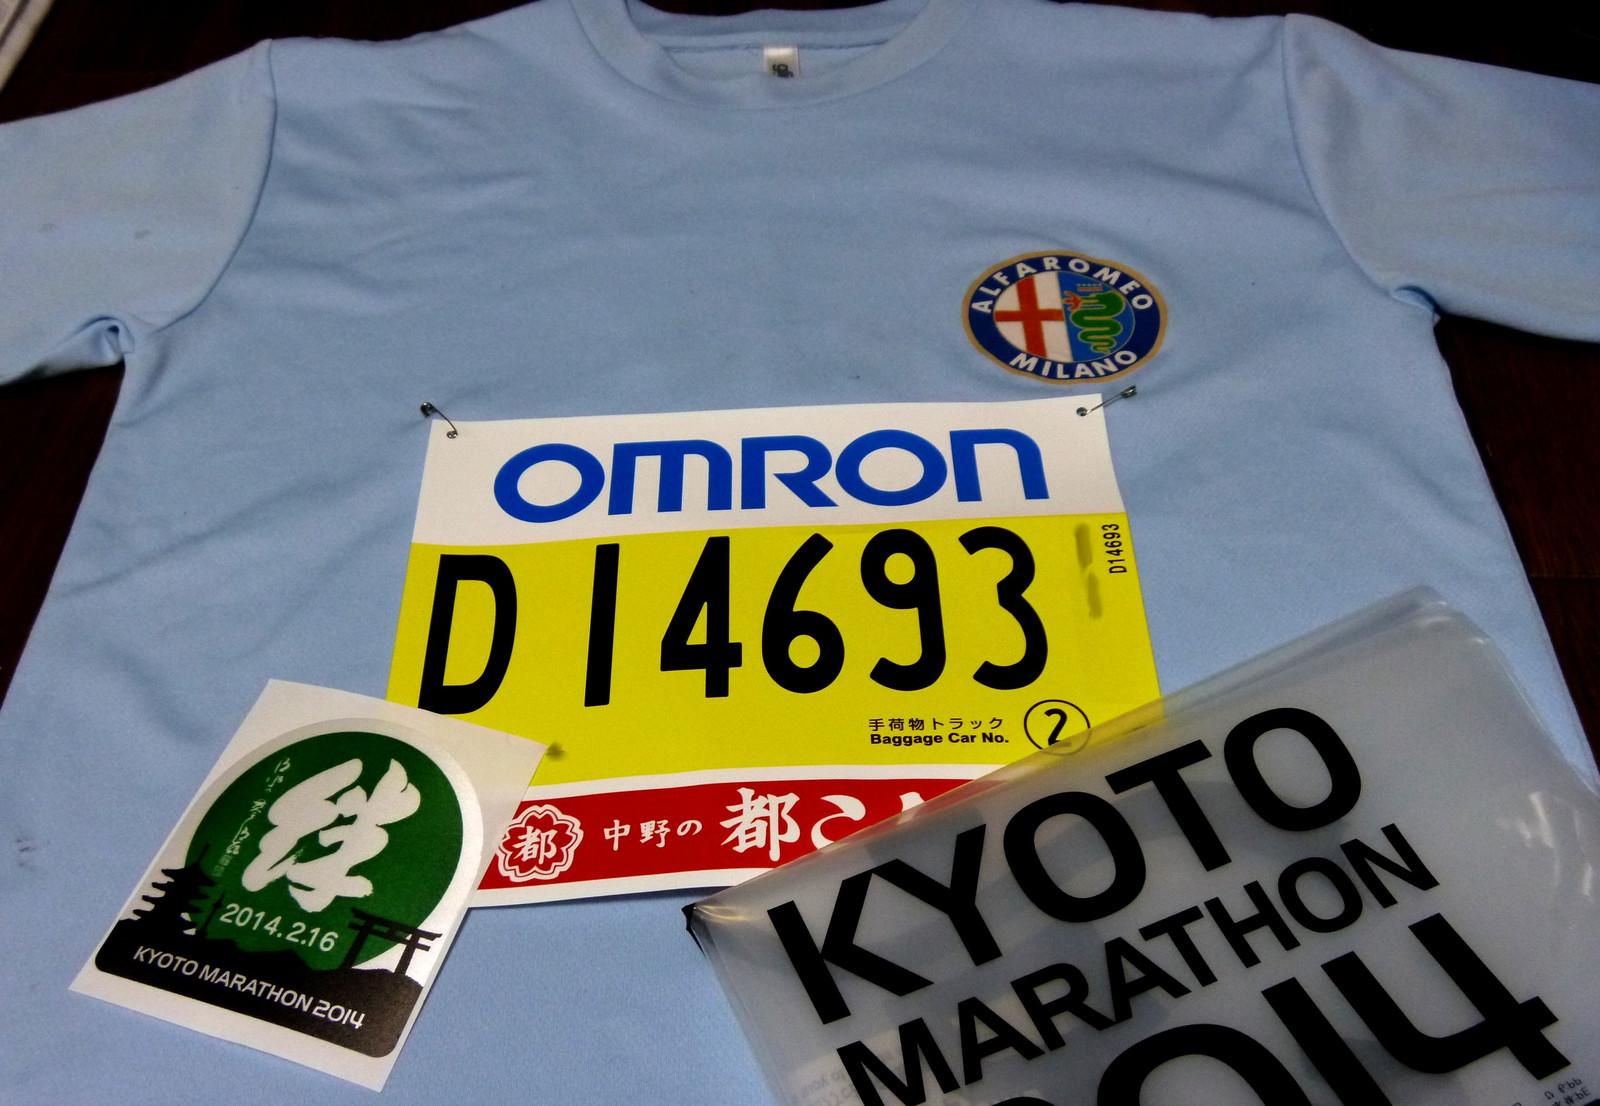 Kyotomarathon2014